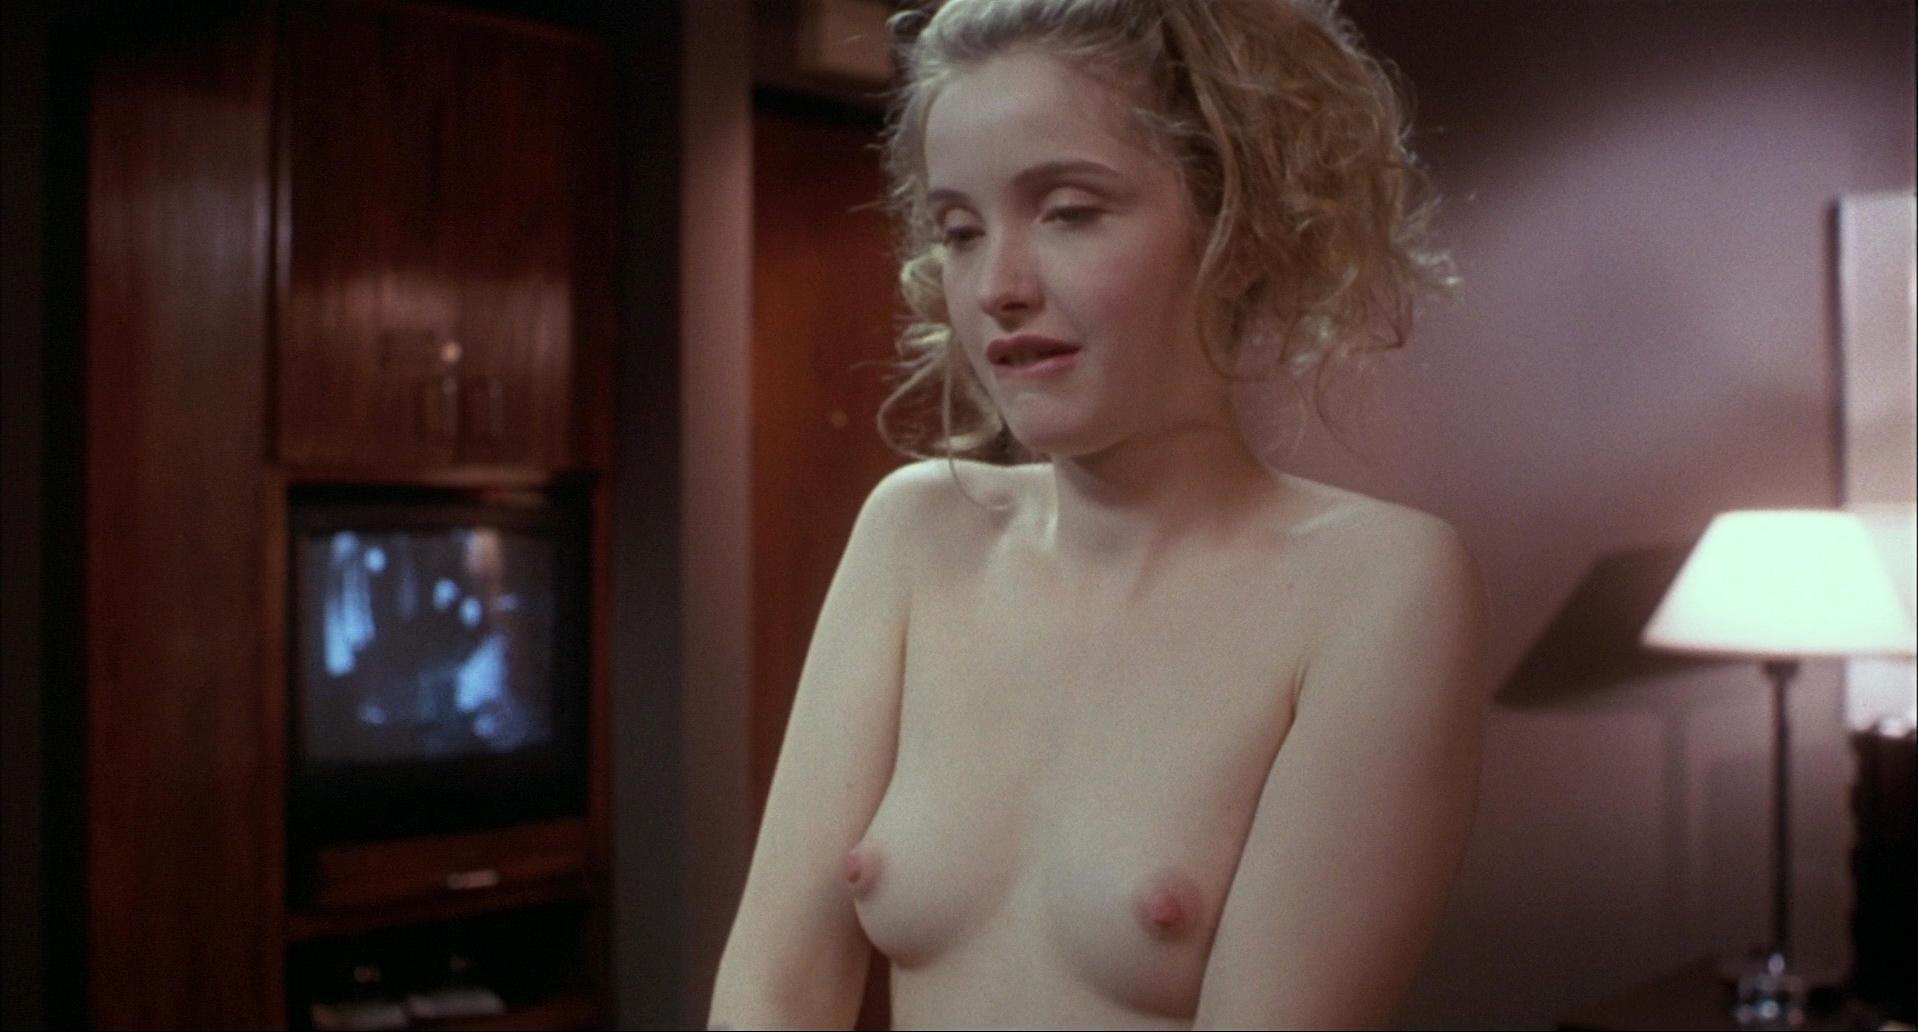 angela white boob play porn videos